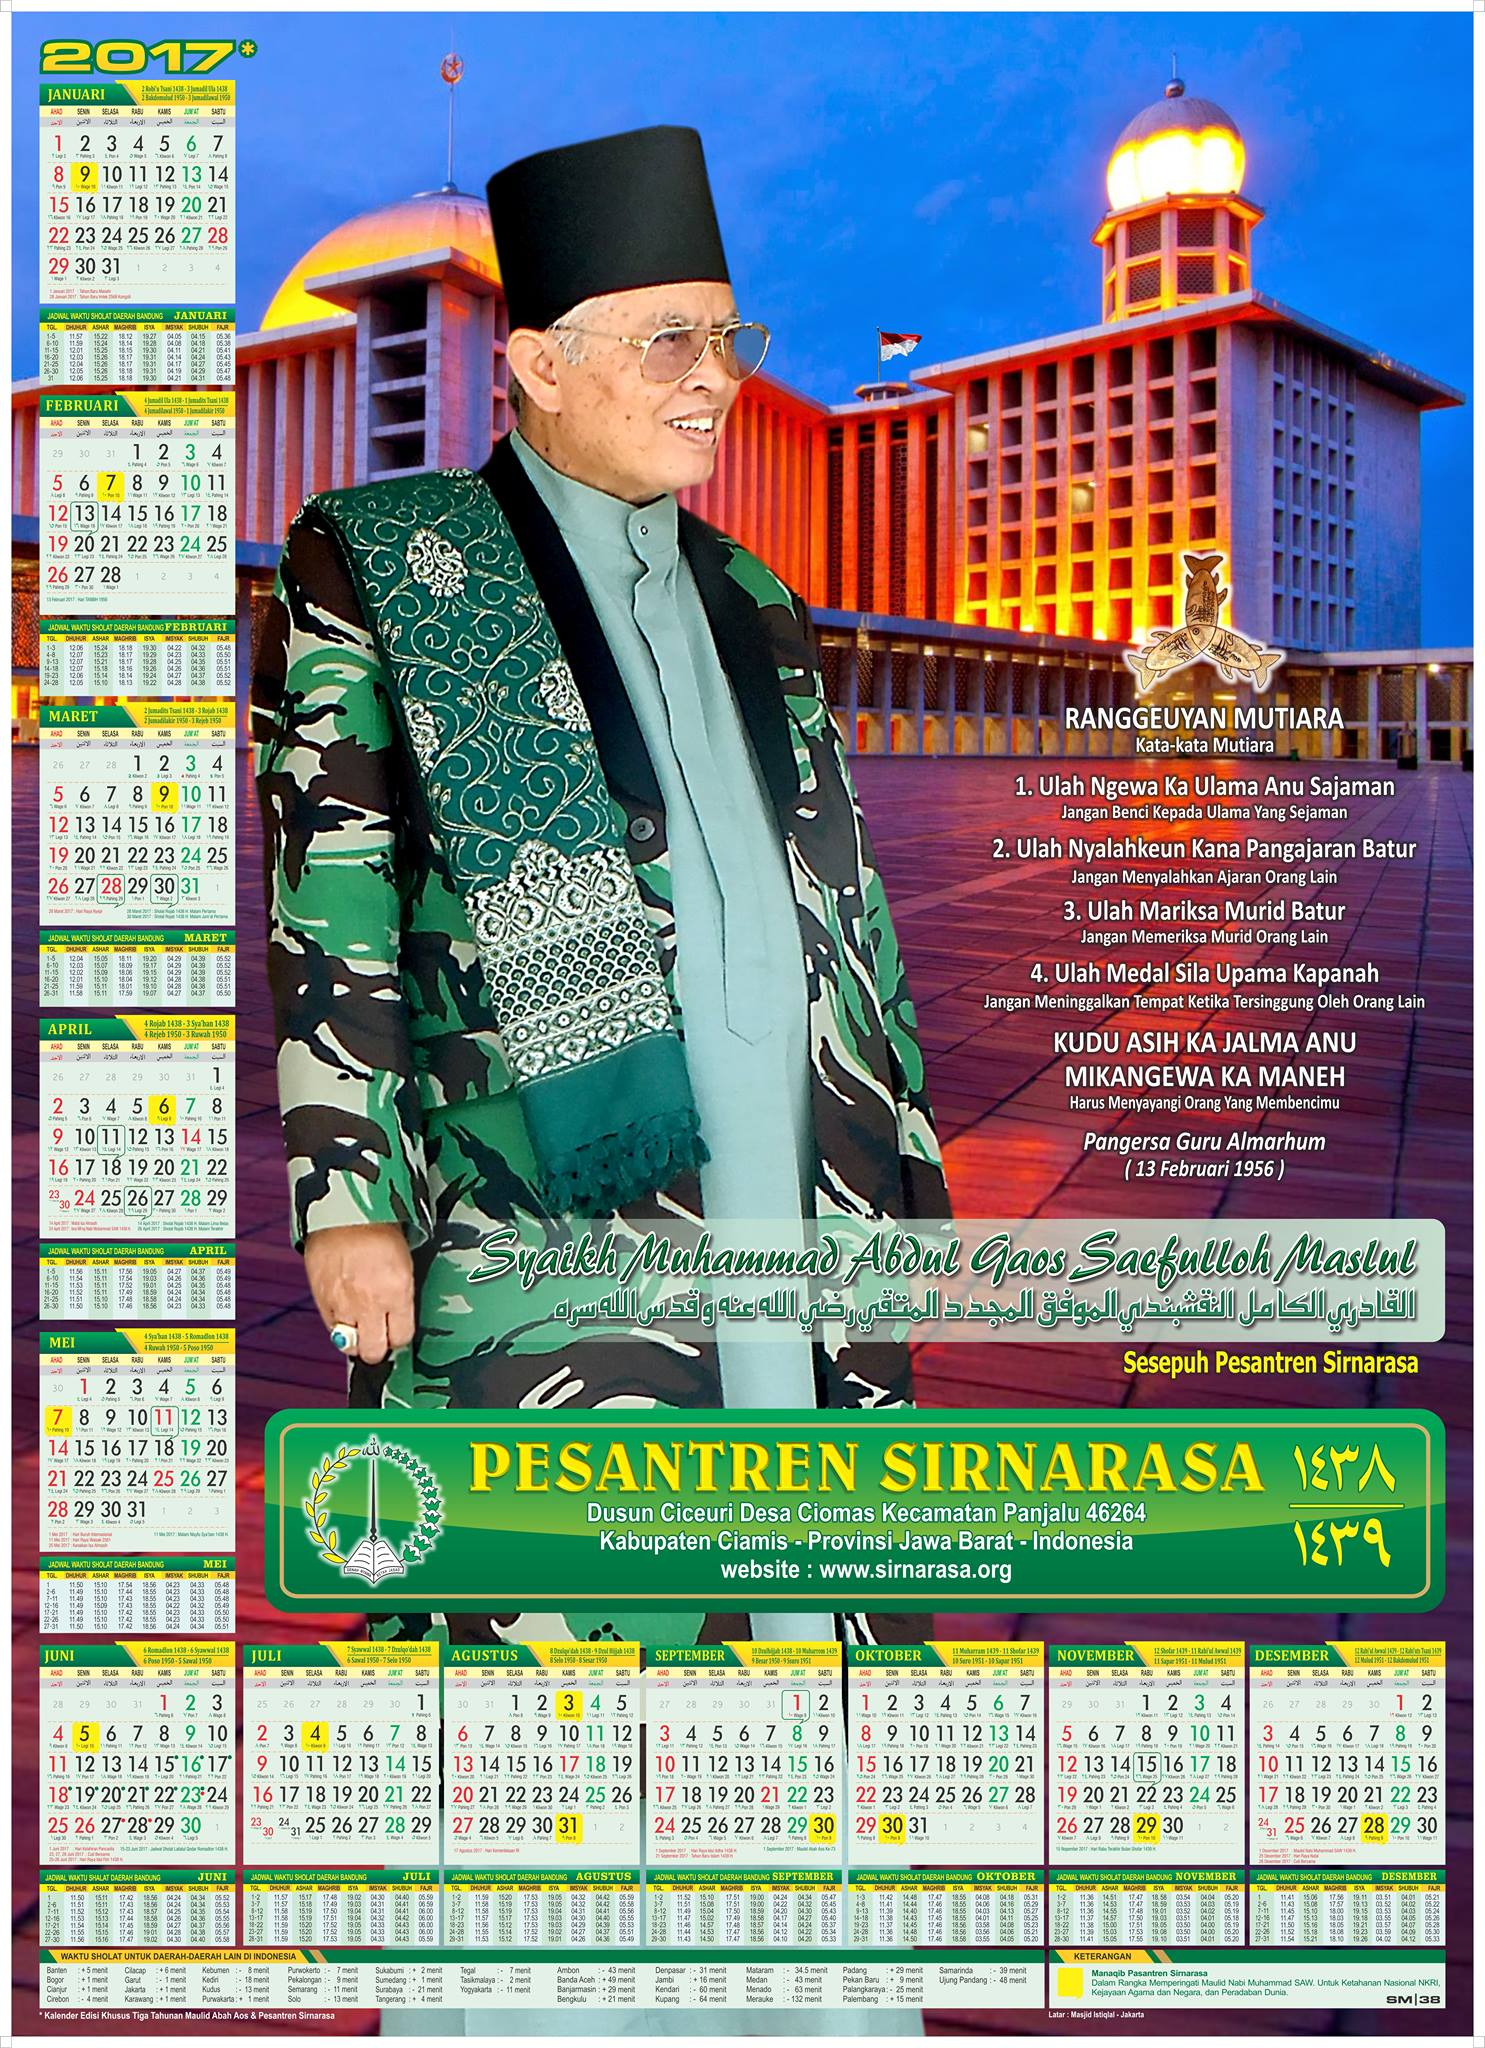 Kalender Pesantren Sirnarasa tahun 2017